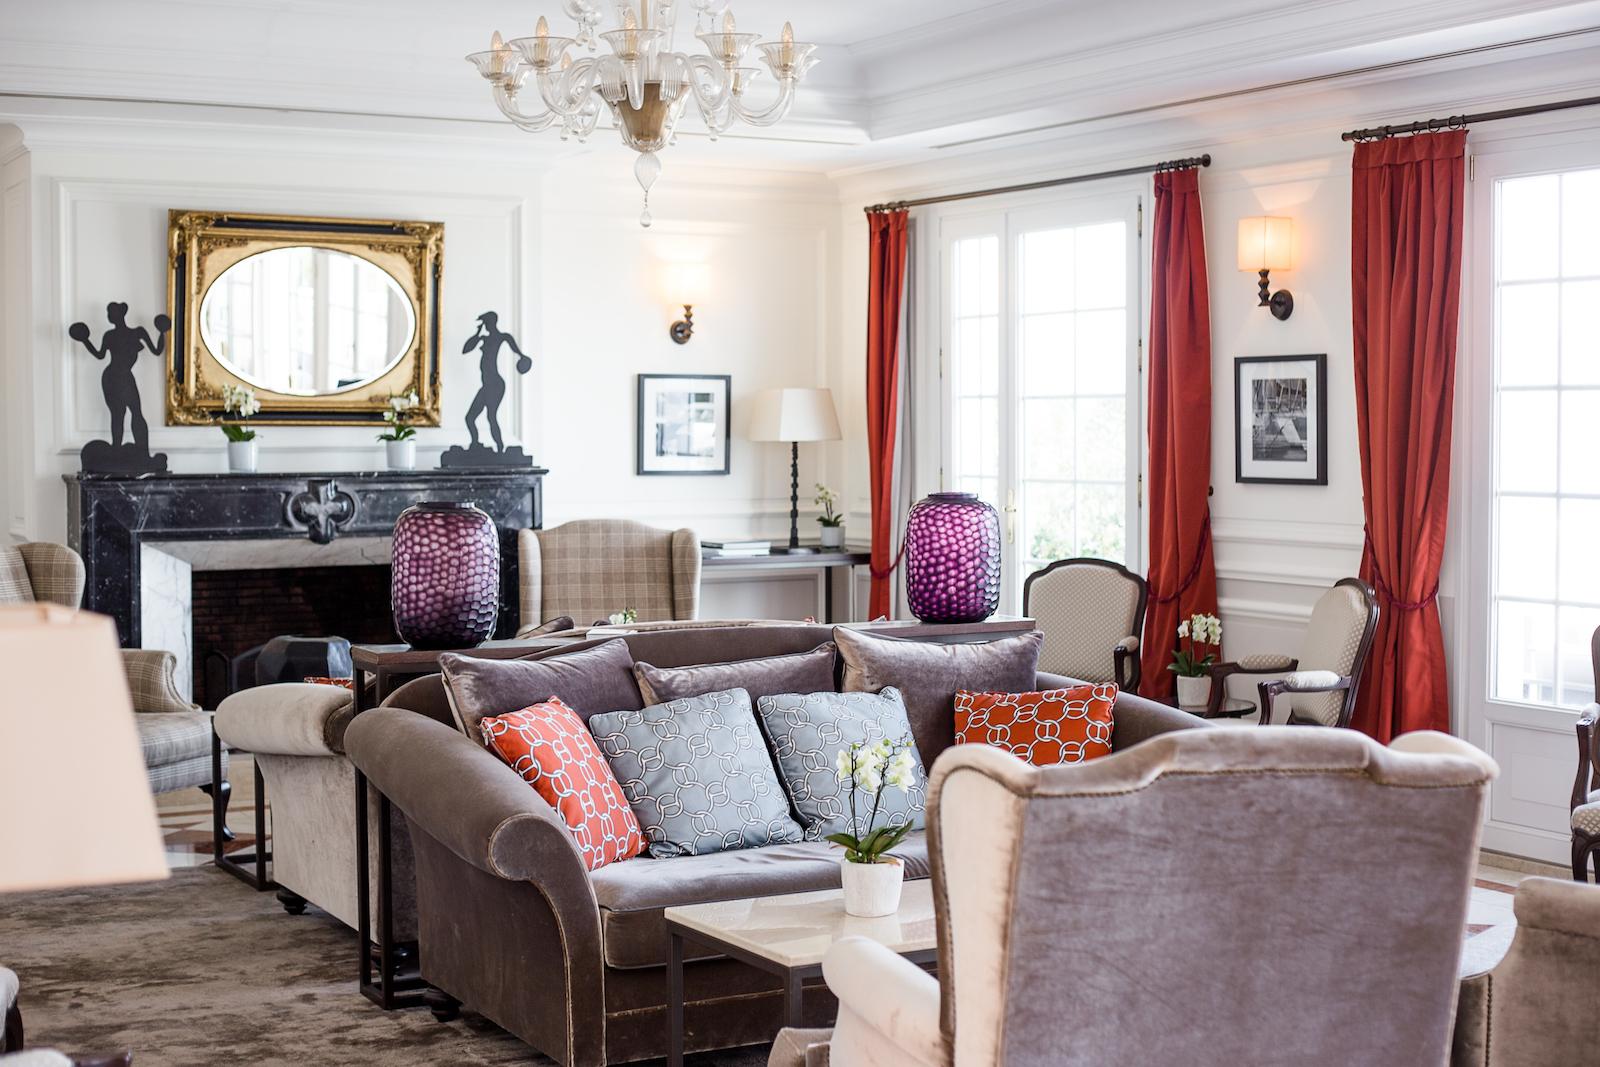 villa-belrose-althoff-hotel-st-tropez-livia-auer-IMG_6247